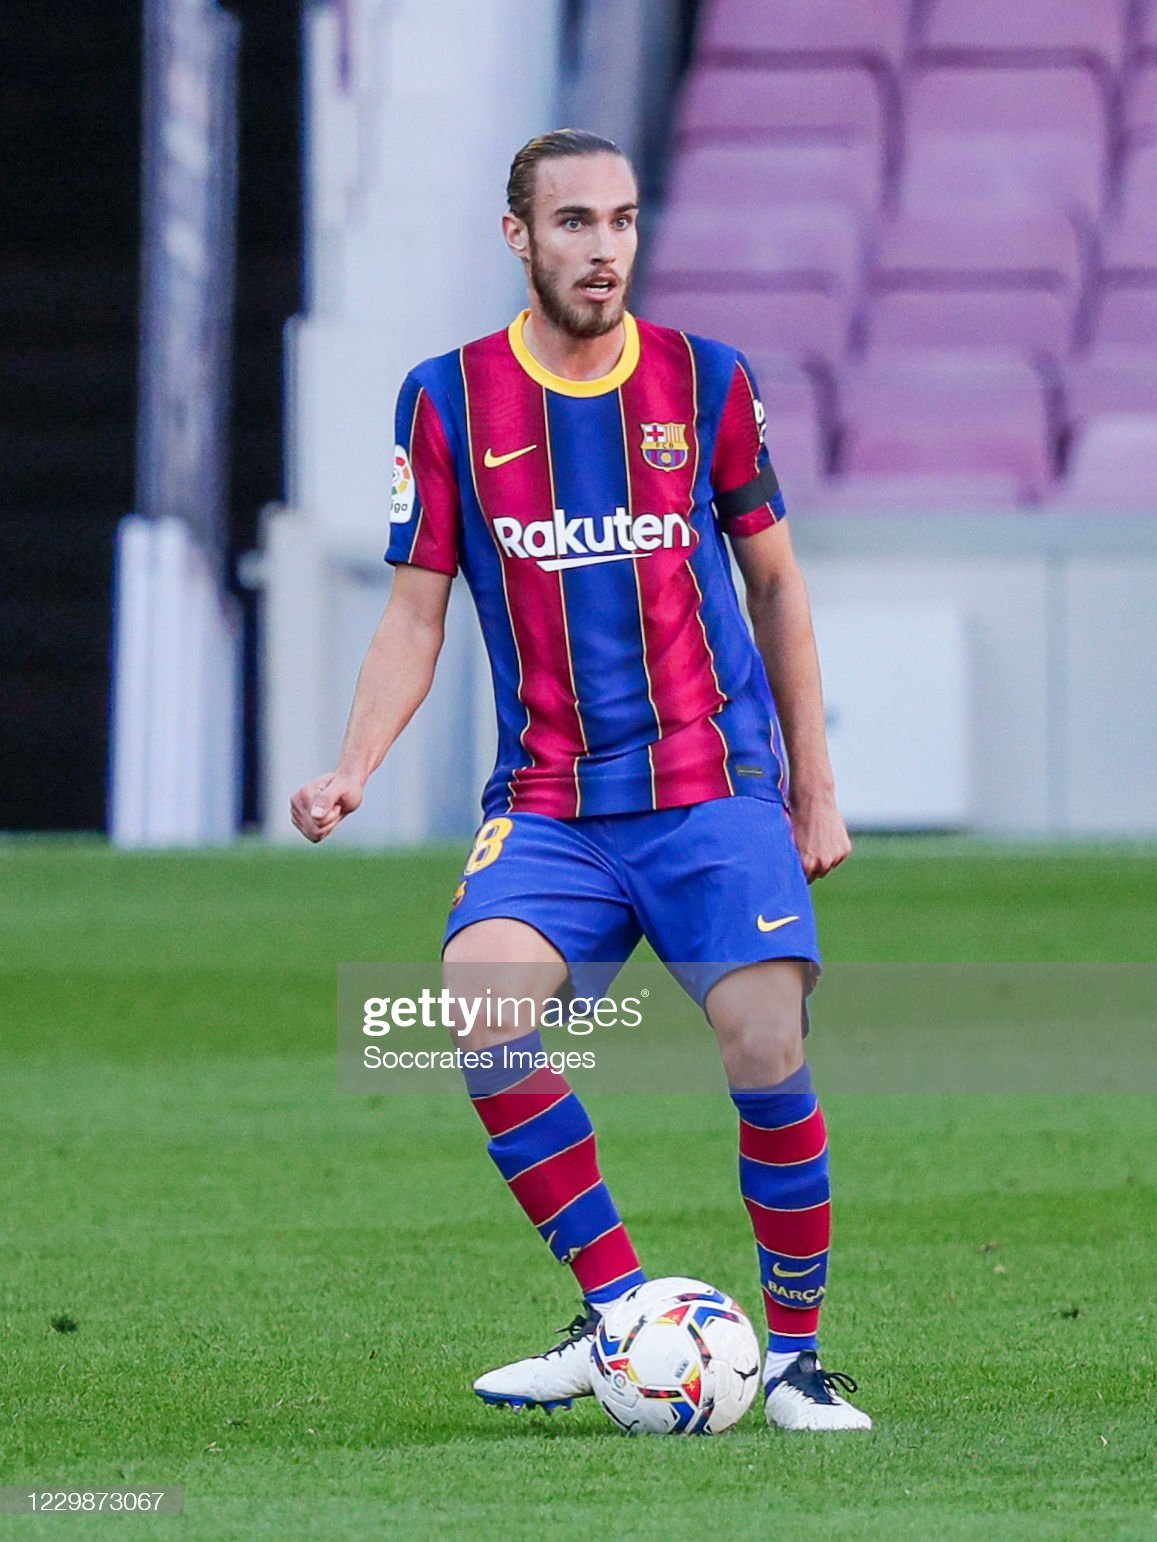 ¿Cuánto mide Óscar Mingueza? - Altura - Real height Oscar-mingueza-of-fc-barcelona-during-the-la-liga-santander-match-fc-picture-id1229873067?s=2048x2048